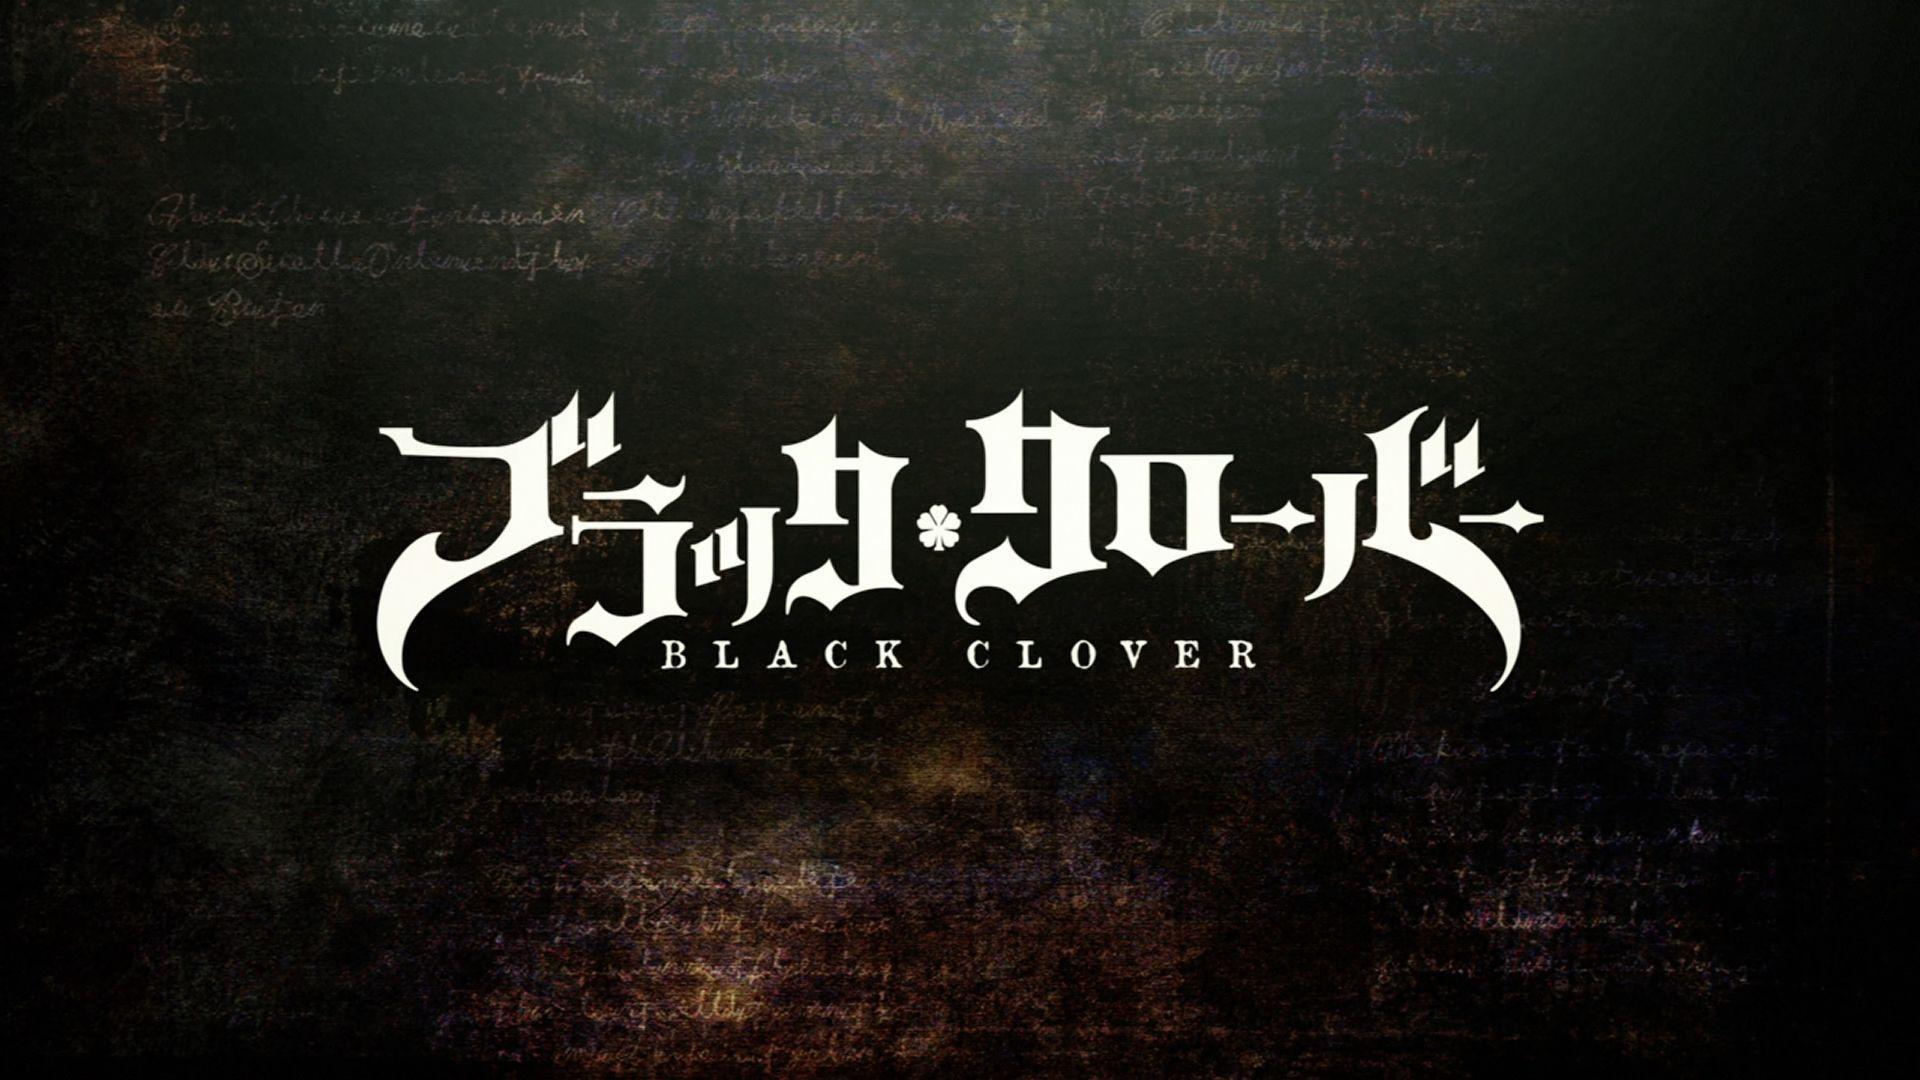 Black Clover Desktop 1920x1080 Wallpapers Wallpaper Cave